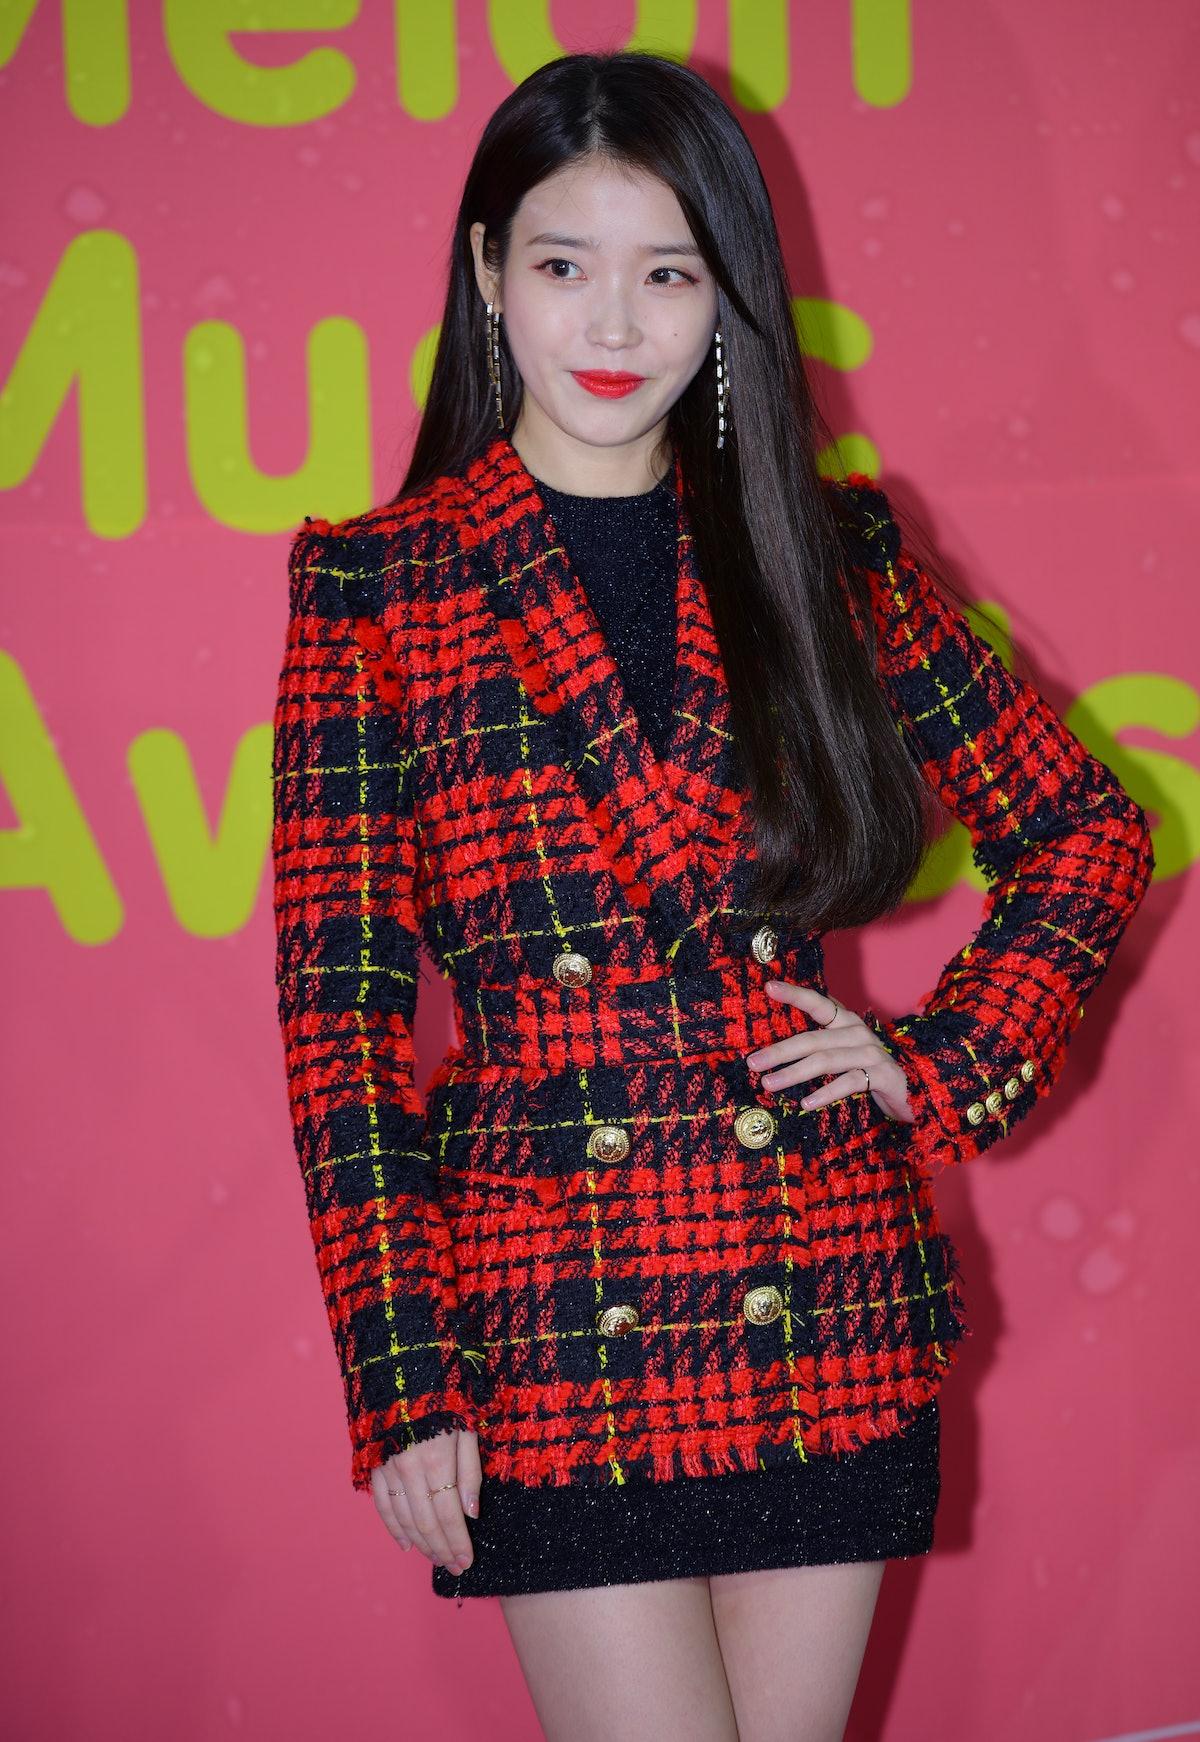 SEOUL, SOUTH KOREA - DECEMBER 02: IU attends the 2017 Melon Music Award at Gocheok Sky Dome on December 02, 2017 in Seoul, South Korea. (Photo by The Chosunilbo JNS/Imazins via Getty Images)